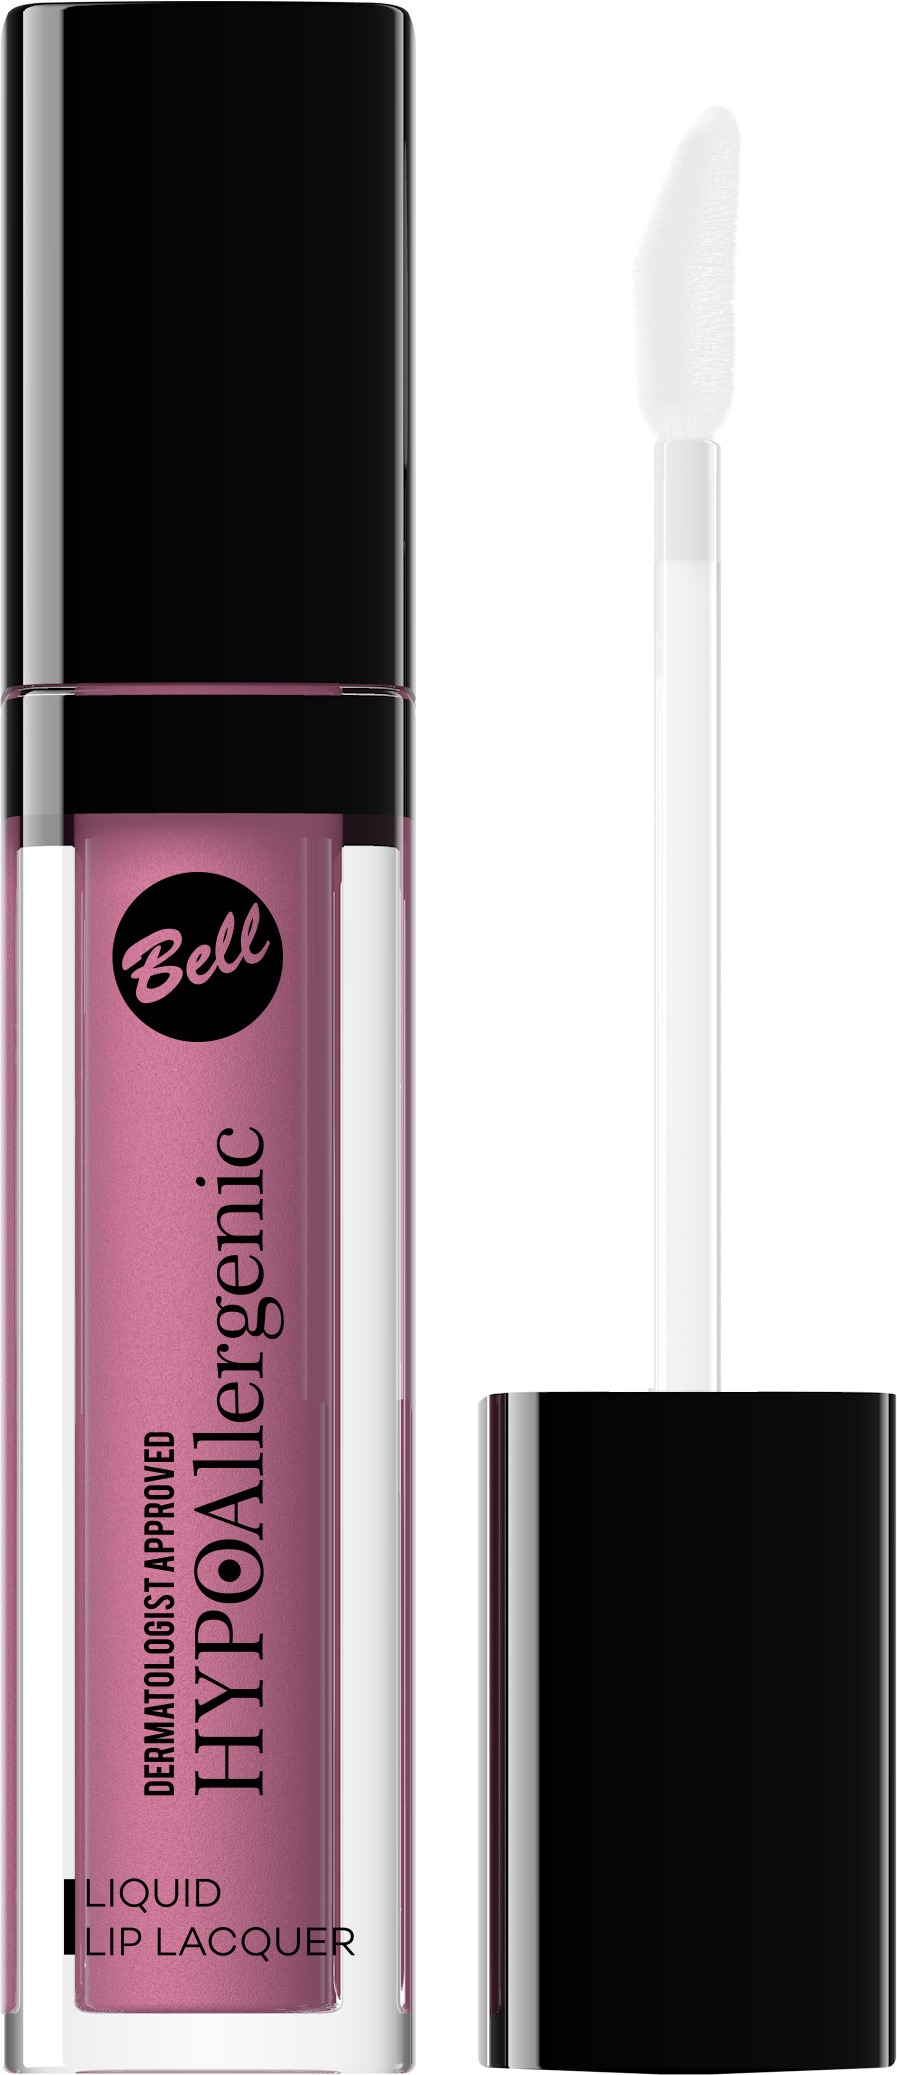 HYPOAllergenic Liquid Lip Lacquer